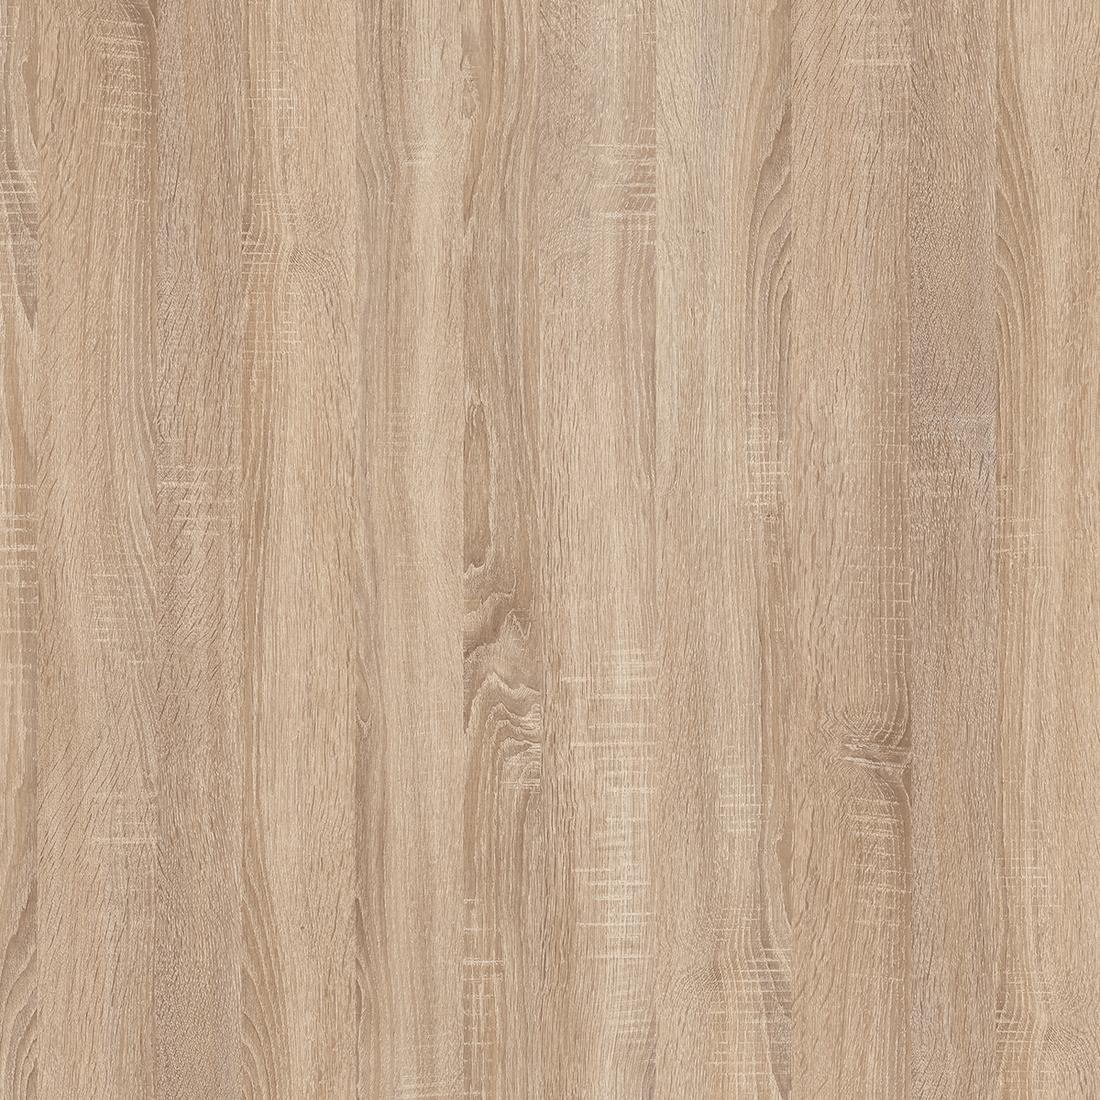 3025SN - Light Sonoma Oak